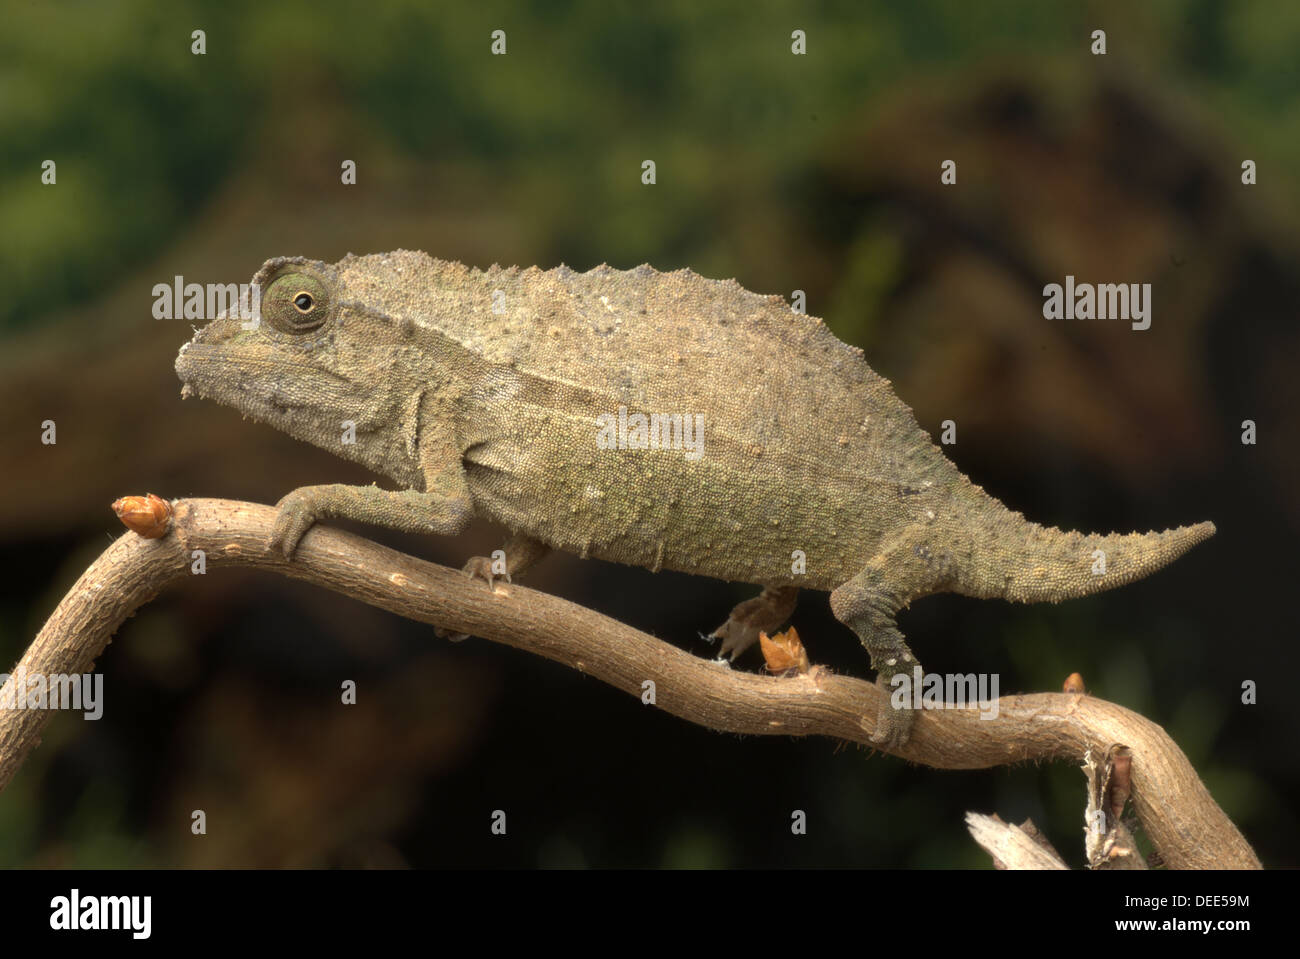 Pygmy Stump Tailed Chameleon Stock Photos Pygmy Stump Tailed